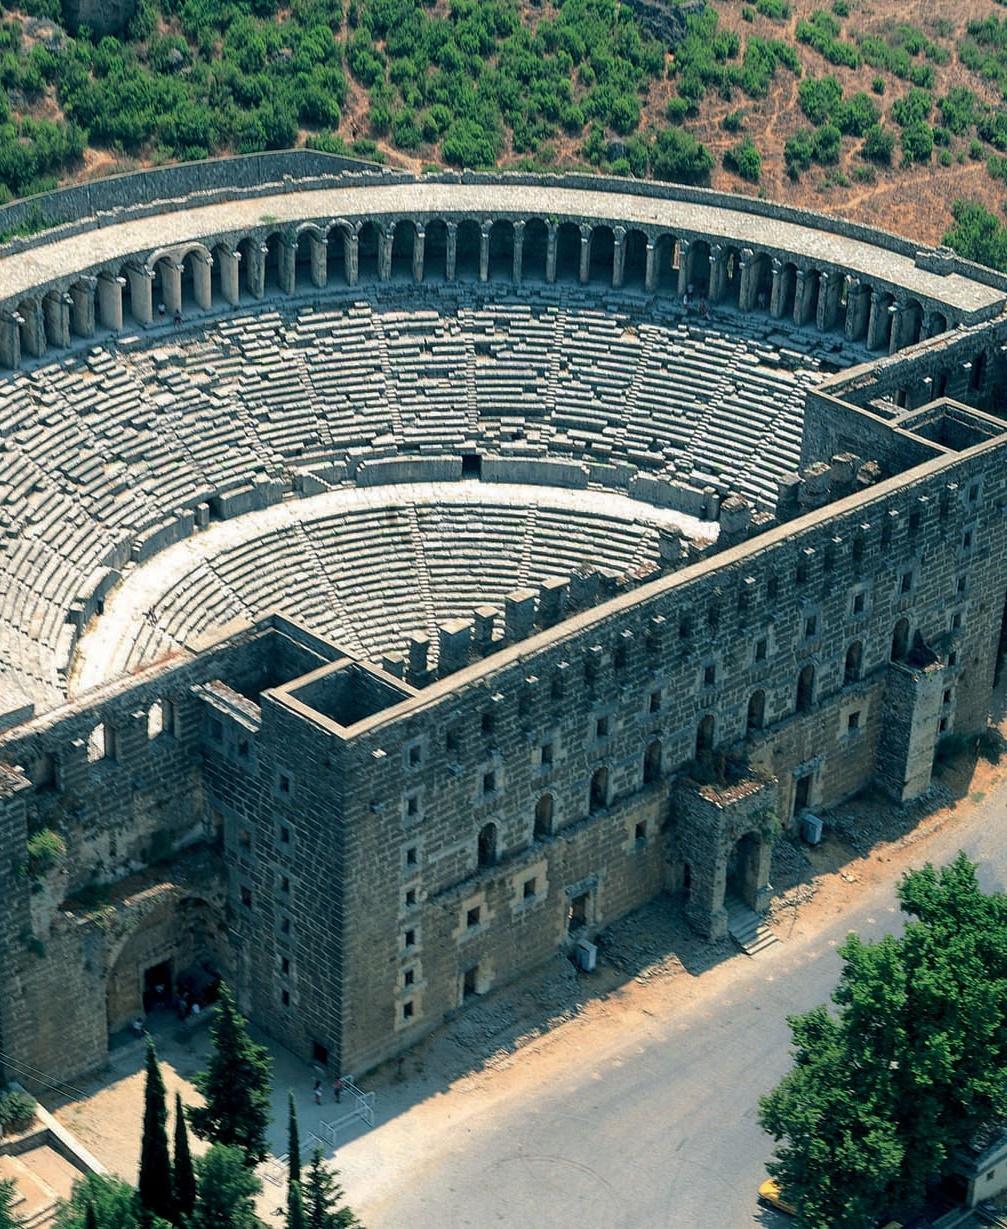 aspendos-antik-kenti-nin-ziyaret-saatleri-kactir